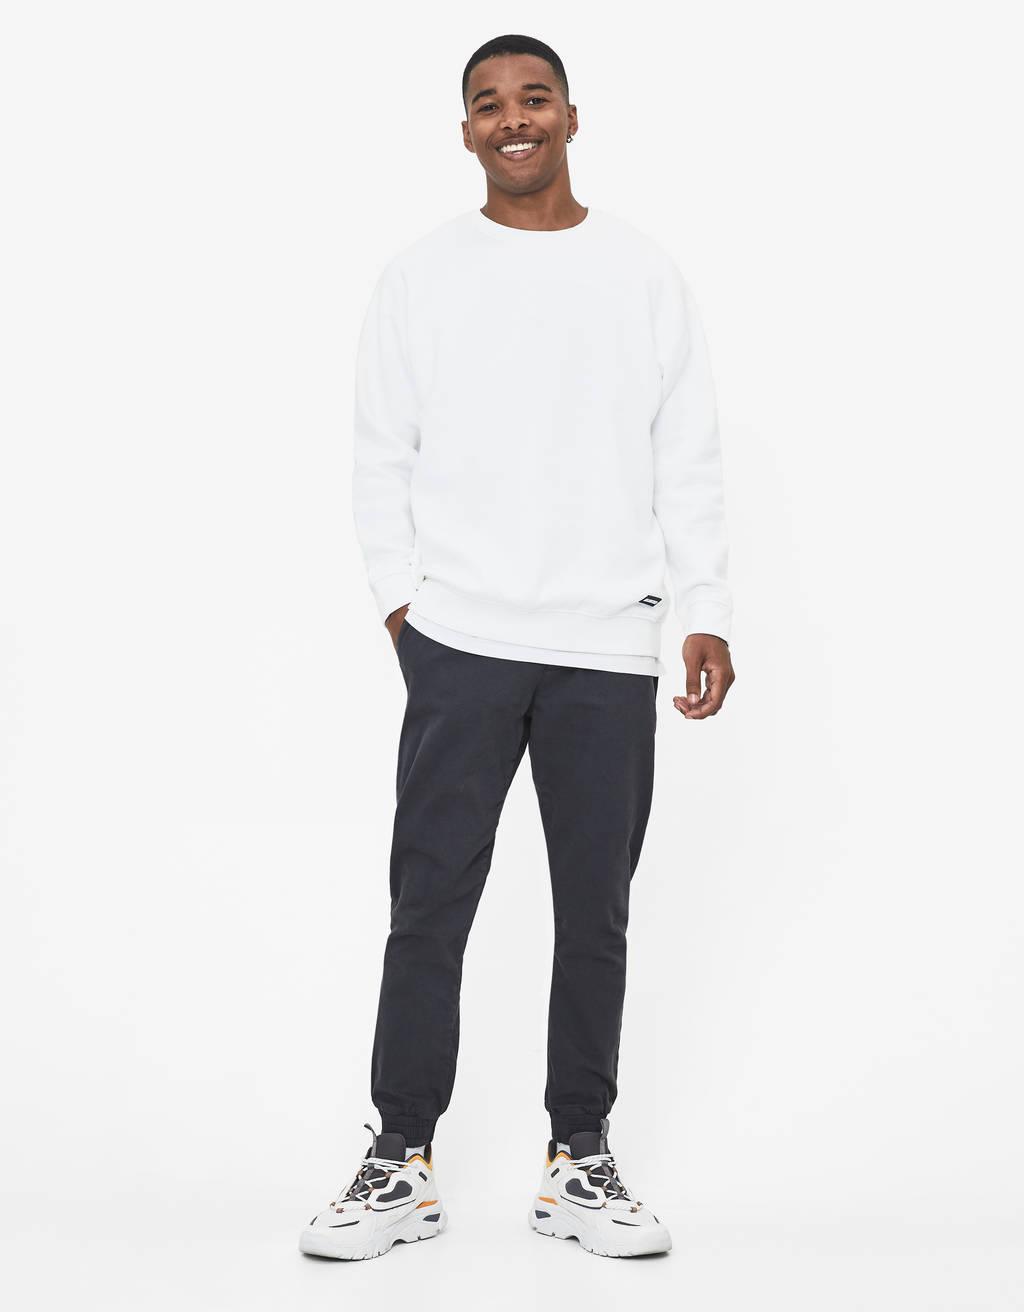 Slim Fit jogging trousers